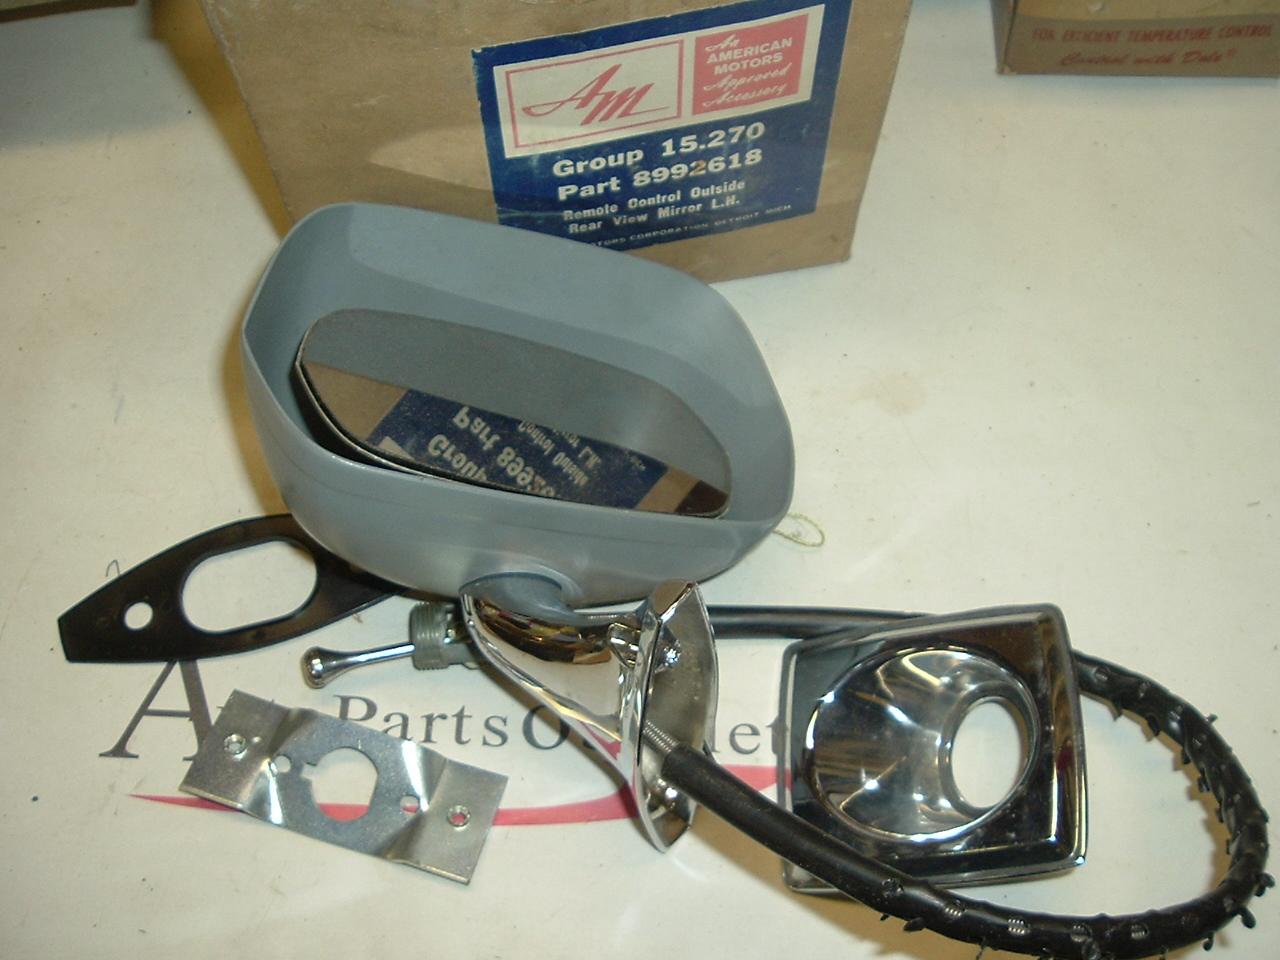 View Product1970 1971 Rambler Rebel MAchine Ambassador remote mirror nos 8992618 (a 8992618)